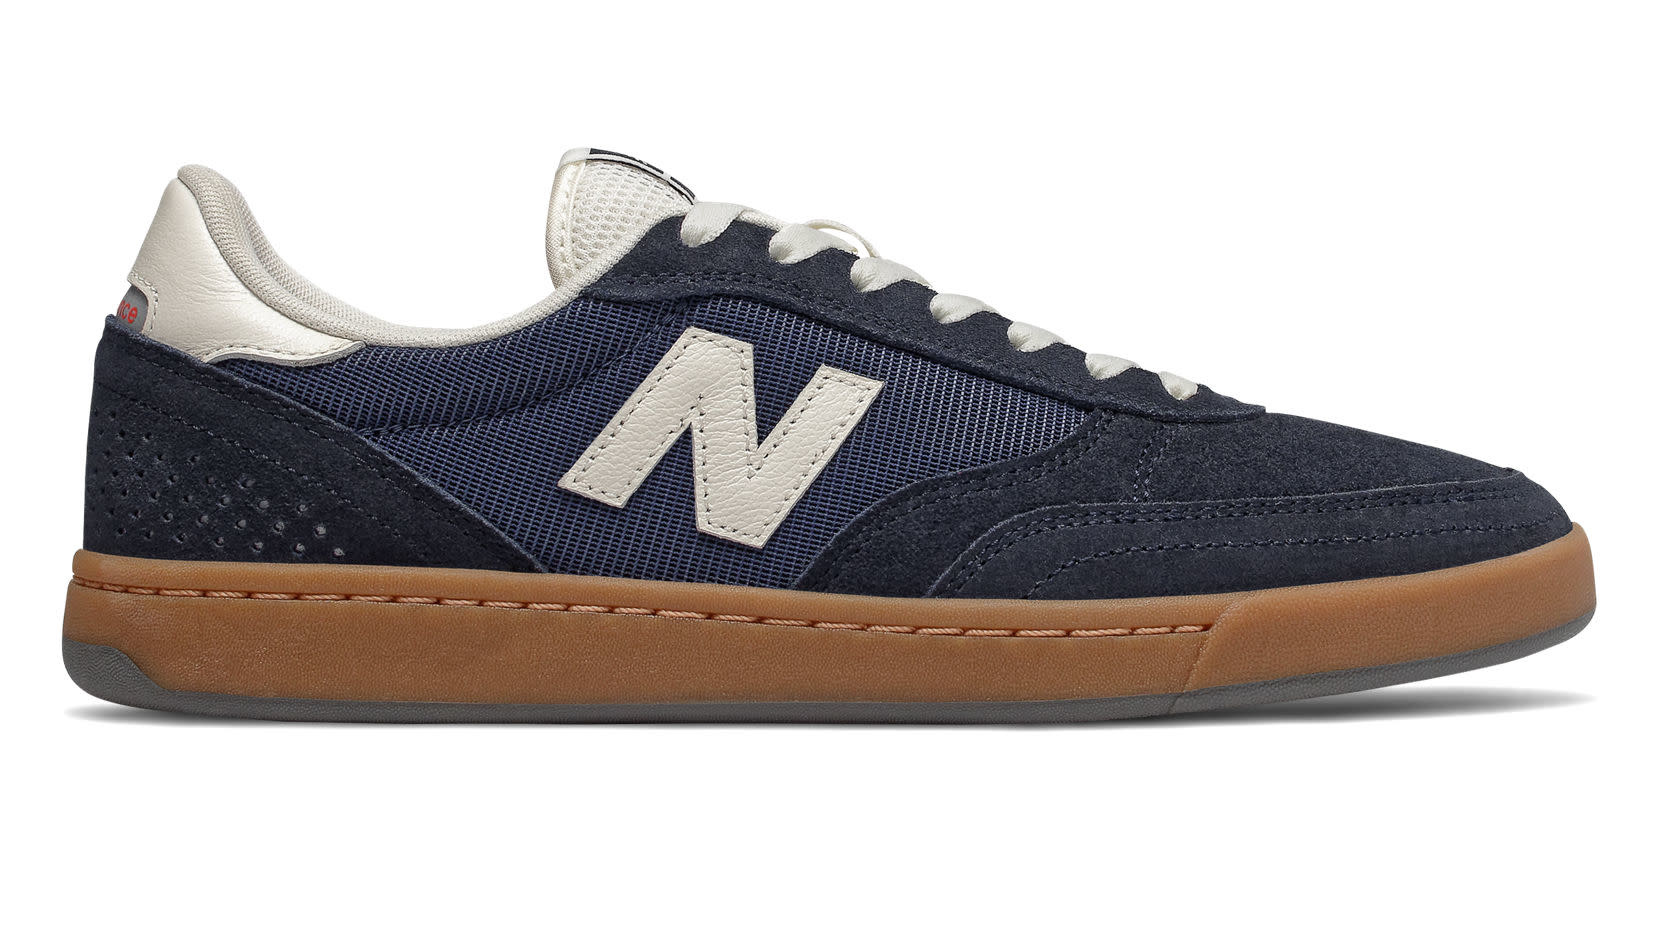 New Balance Numeric New Balance 440 - Navy/Gum